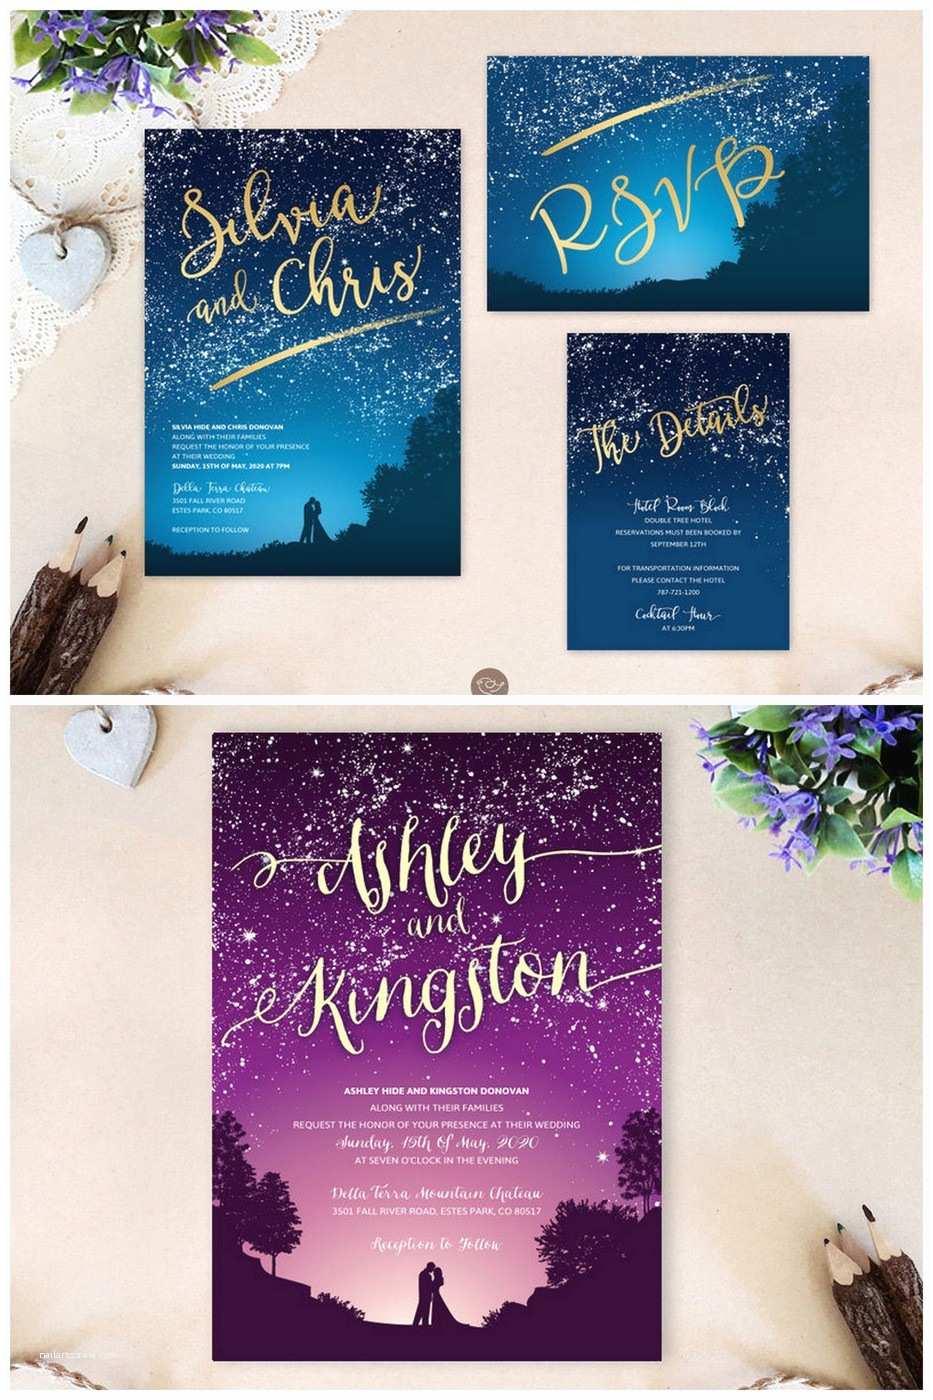 Starry Night Wedding Invitations 16 Starry Night Celestial Wedding Invitations to Light Up